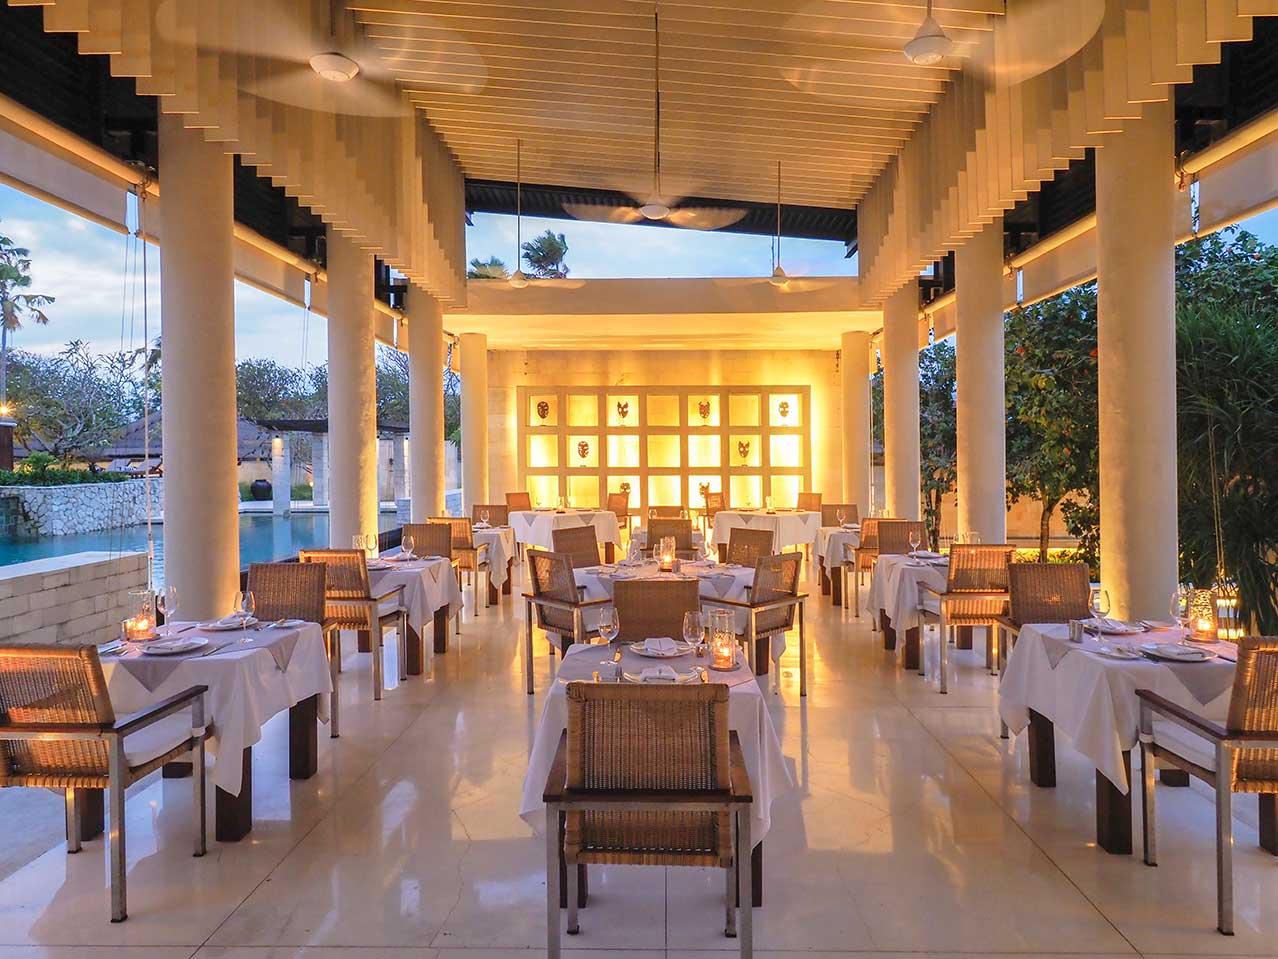 Faces Restaurant, resto fine dining dengan konsep terbuka (Sumber: thebale.com)